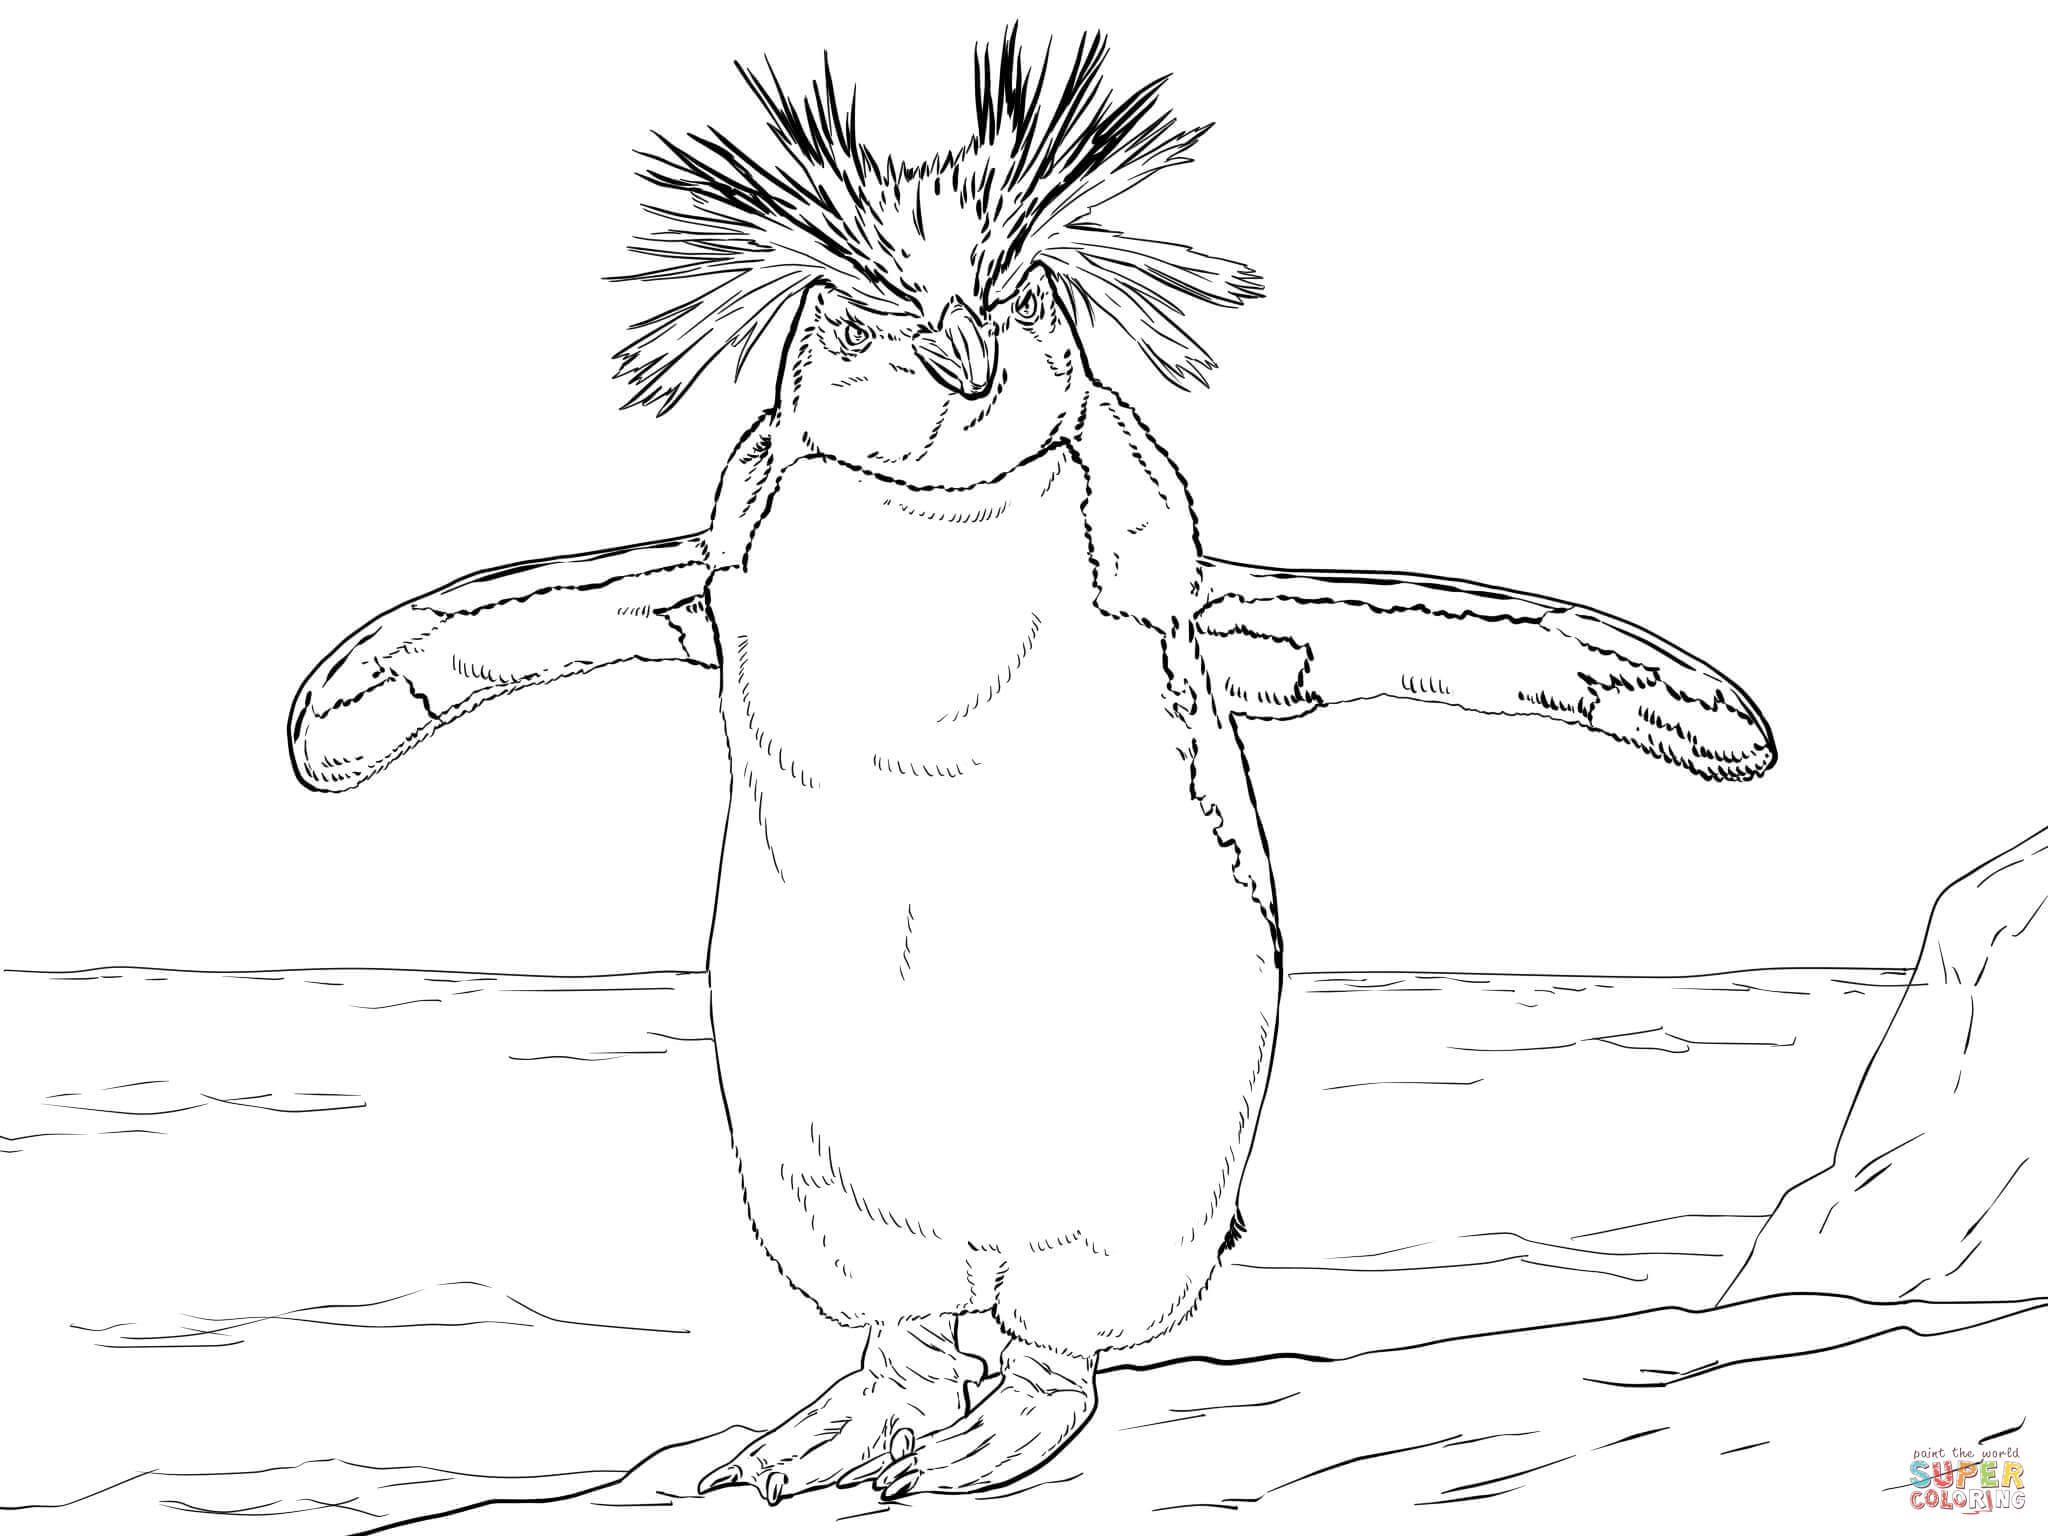 Rockhopper Penguin coloring #18, Download drawings